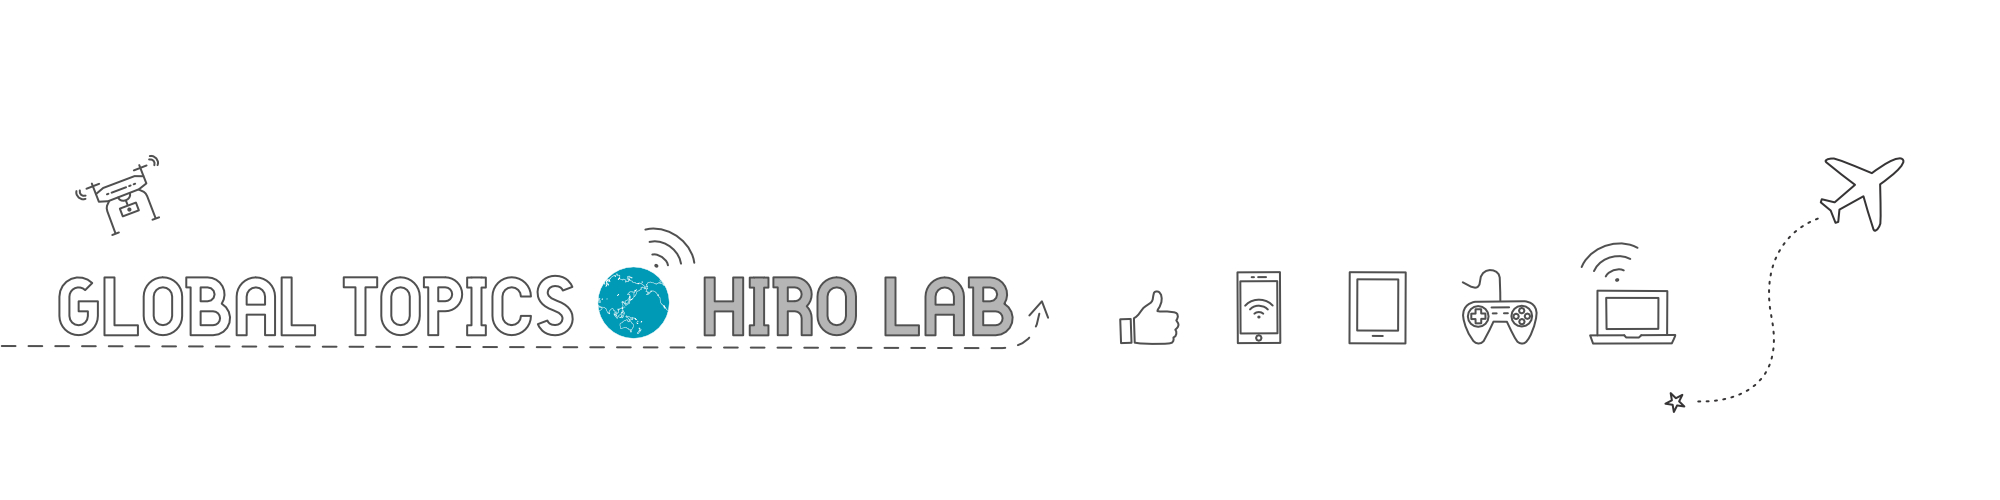 GLOBAL TOPICS -HIRO LAB-